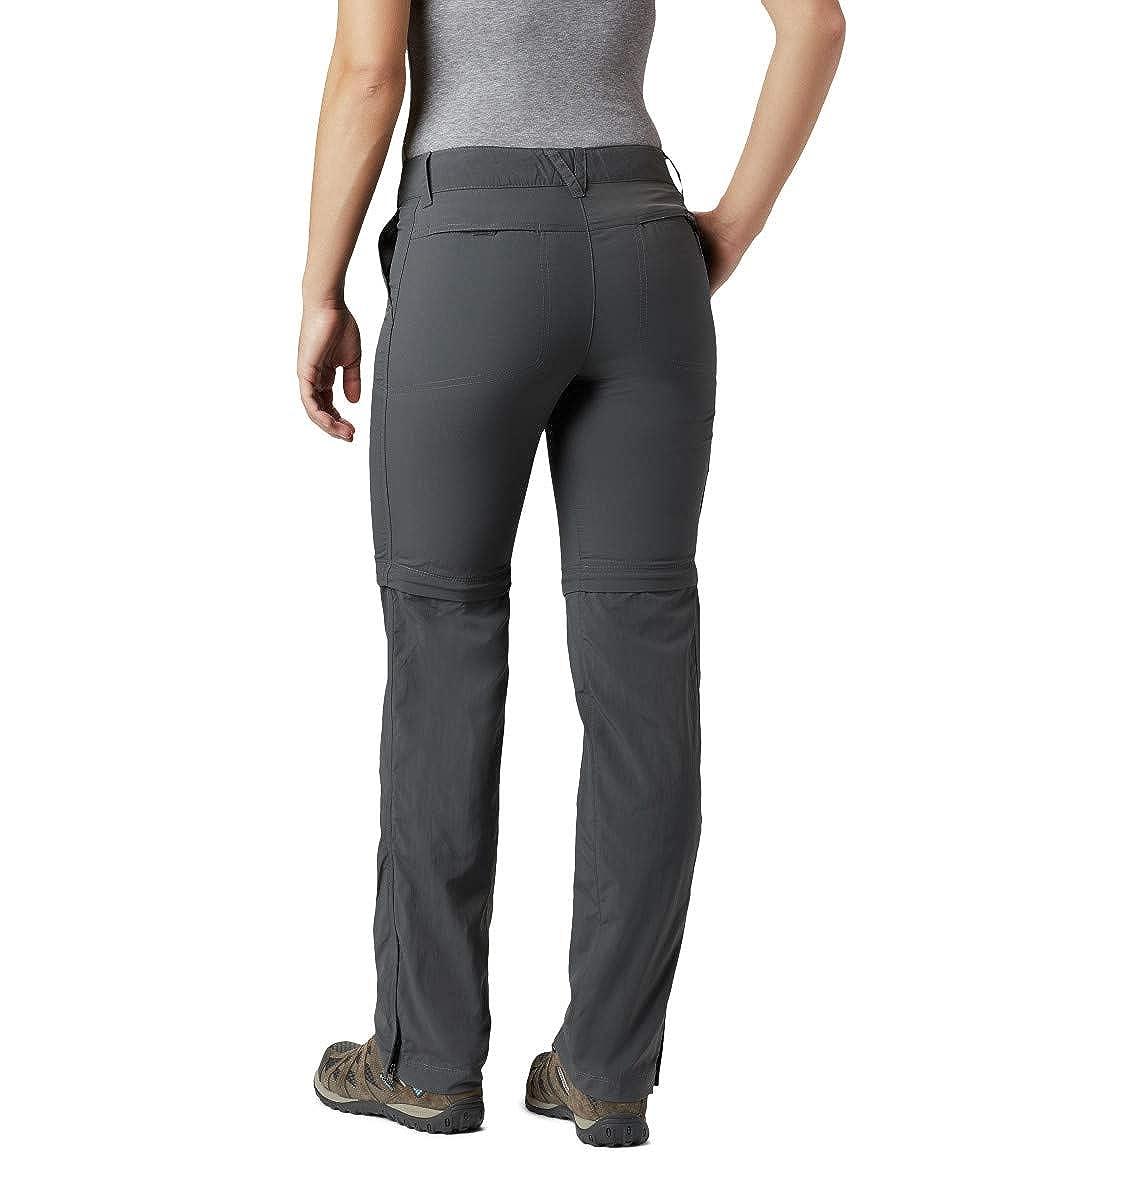 6 Regular Grill Columbia Womens Silver Ridge 2.0 Convertible Pant